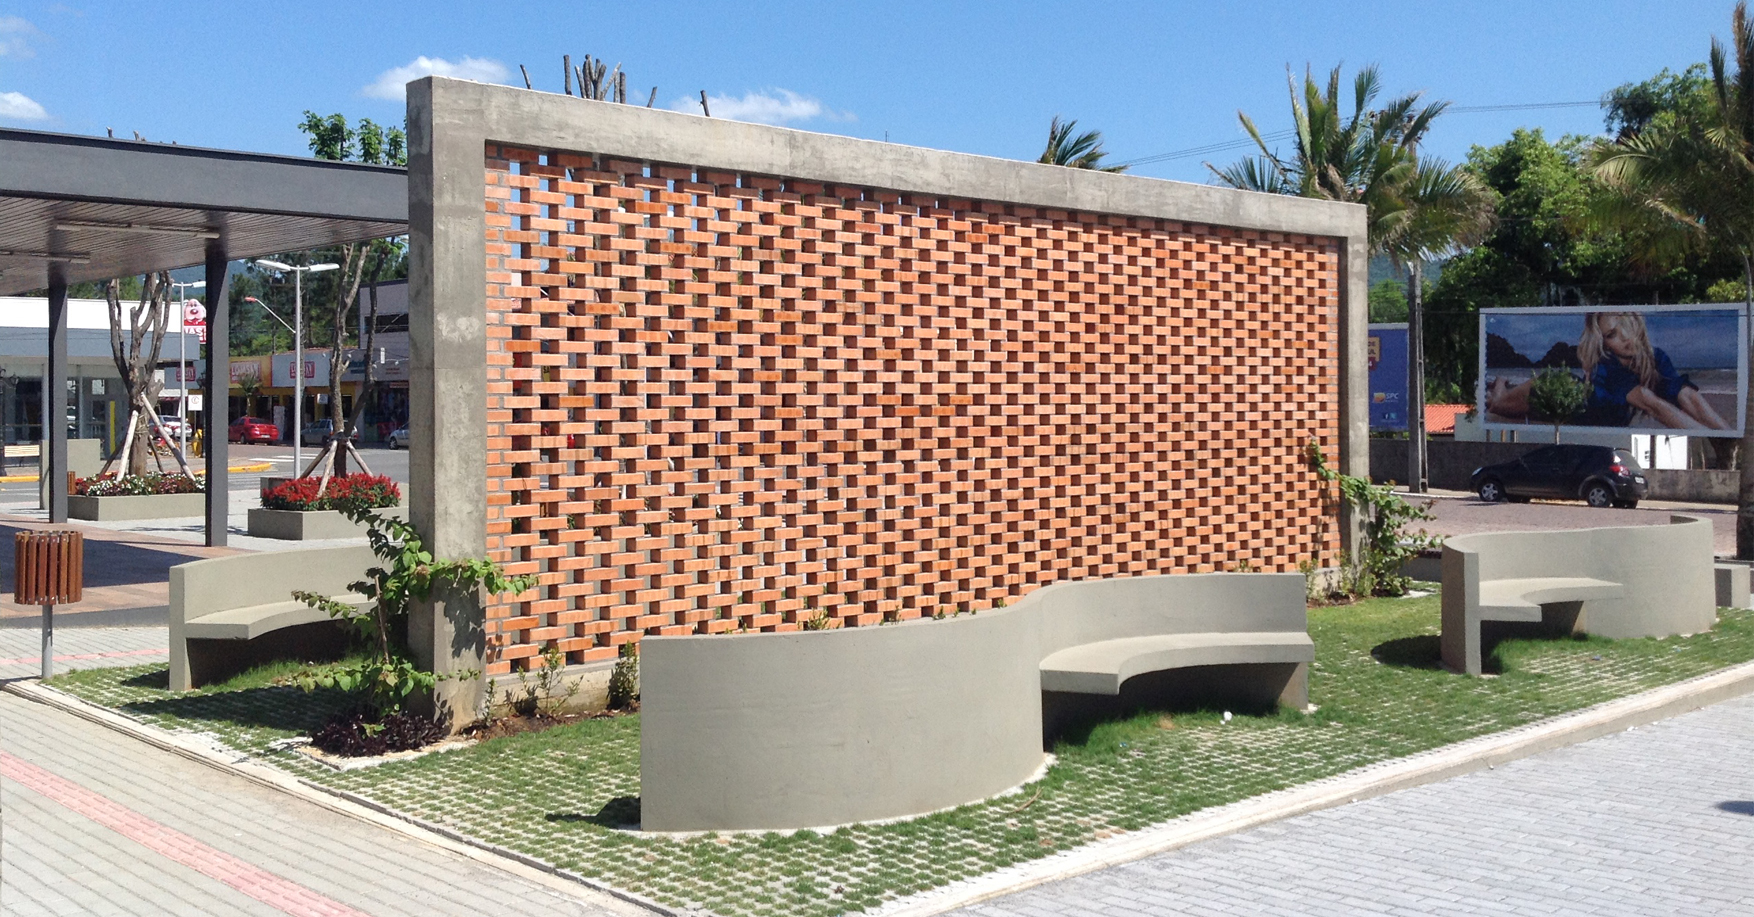 PJV - Praça de Corupá